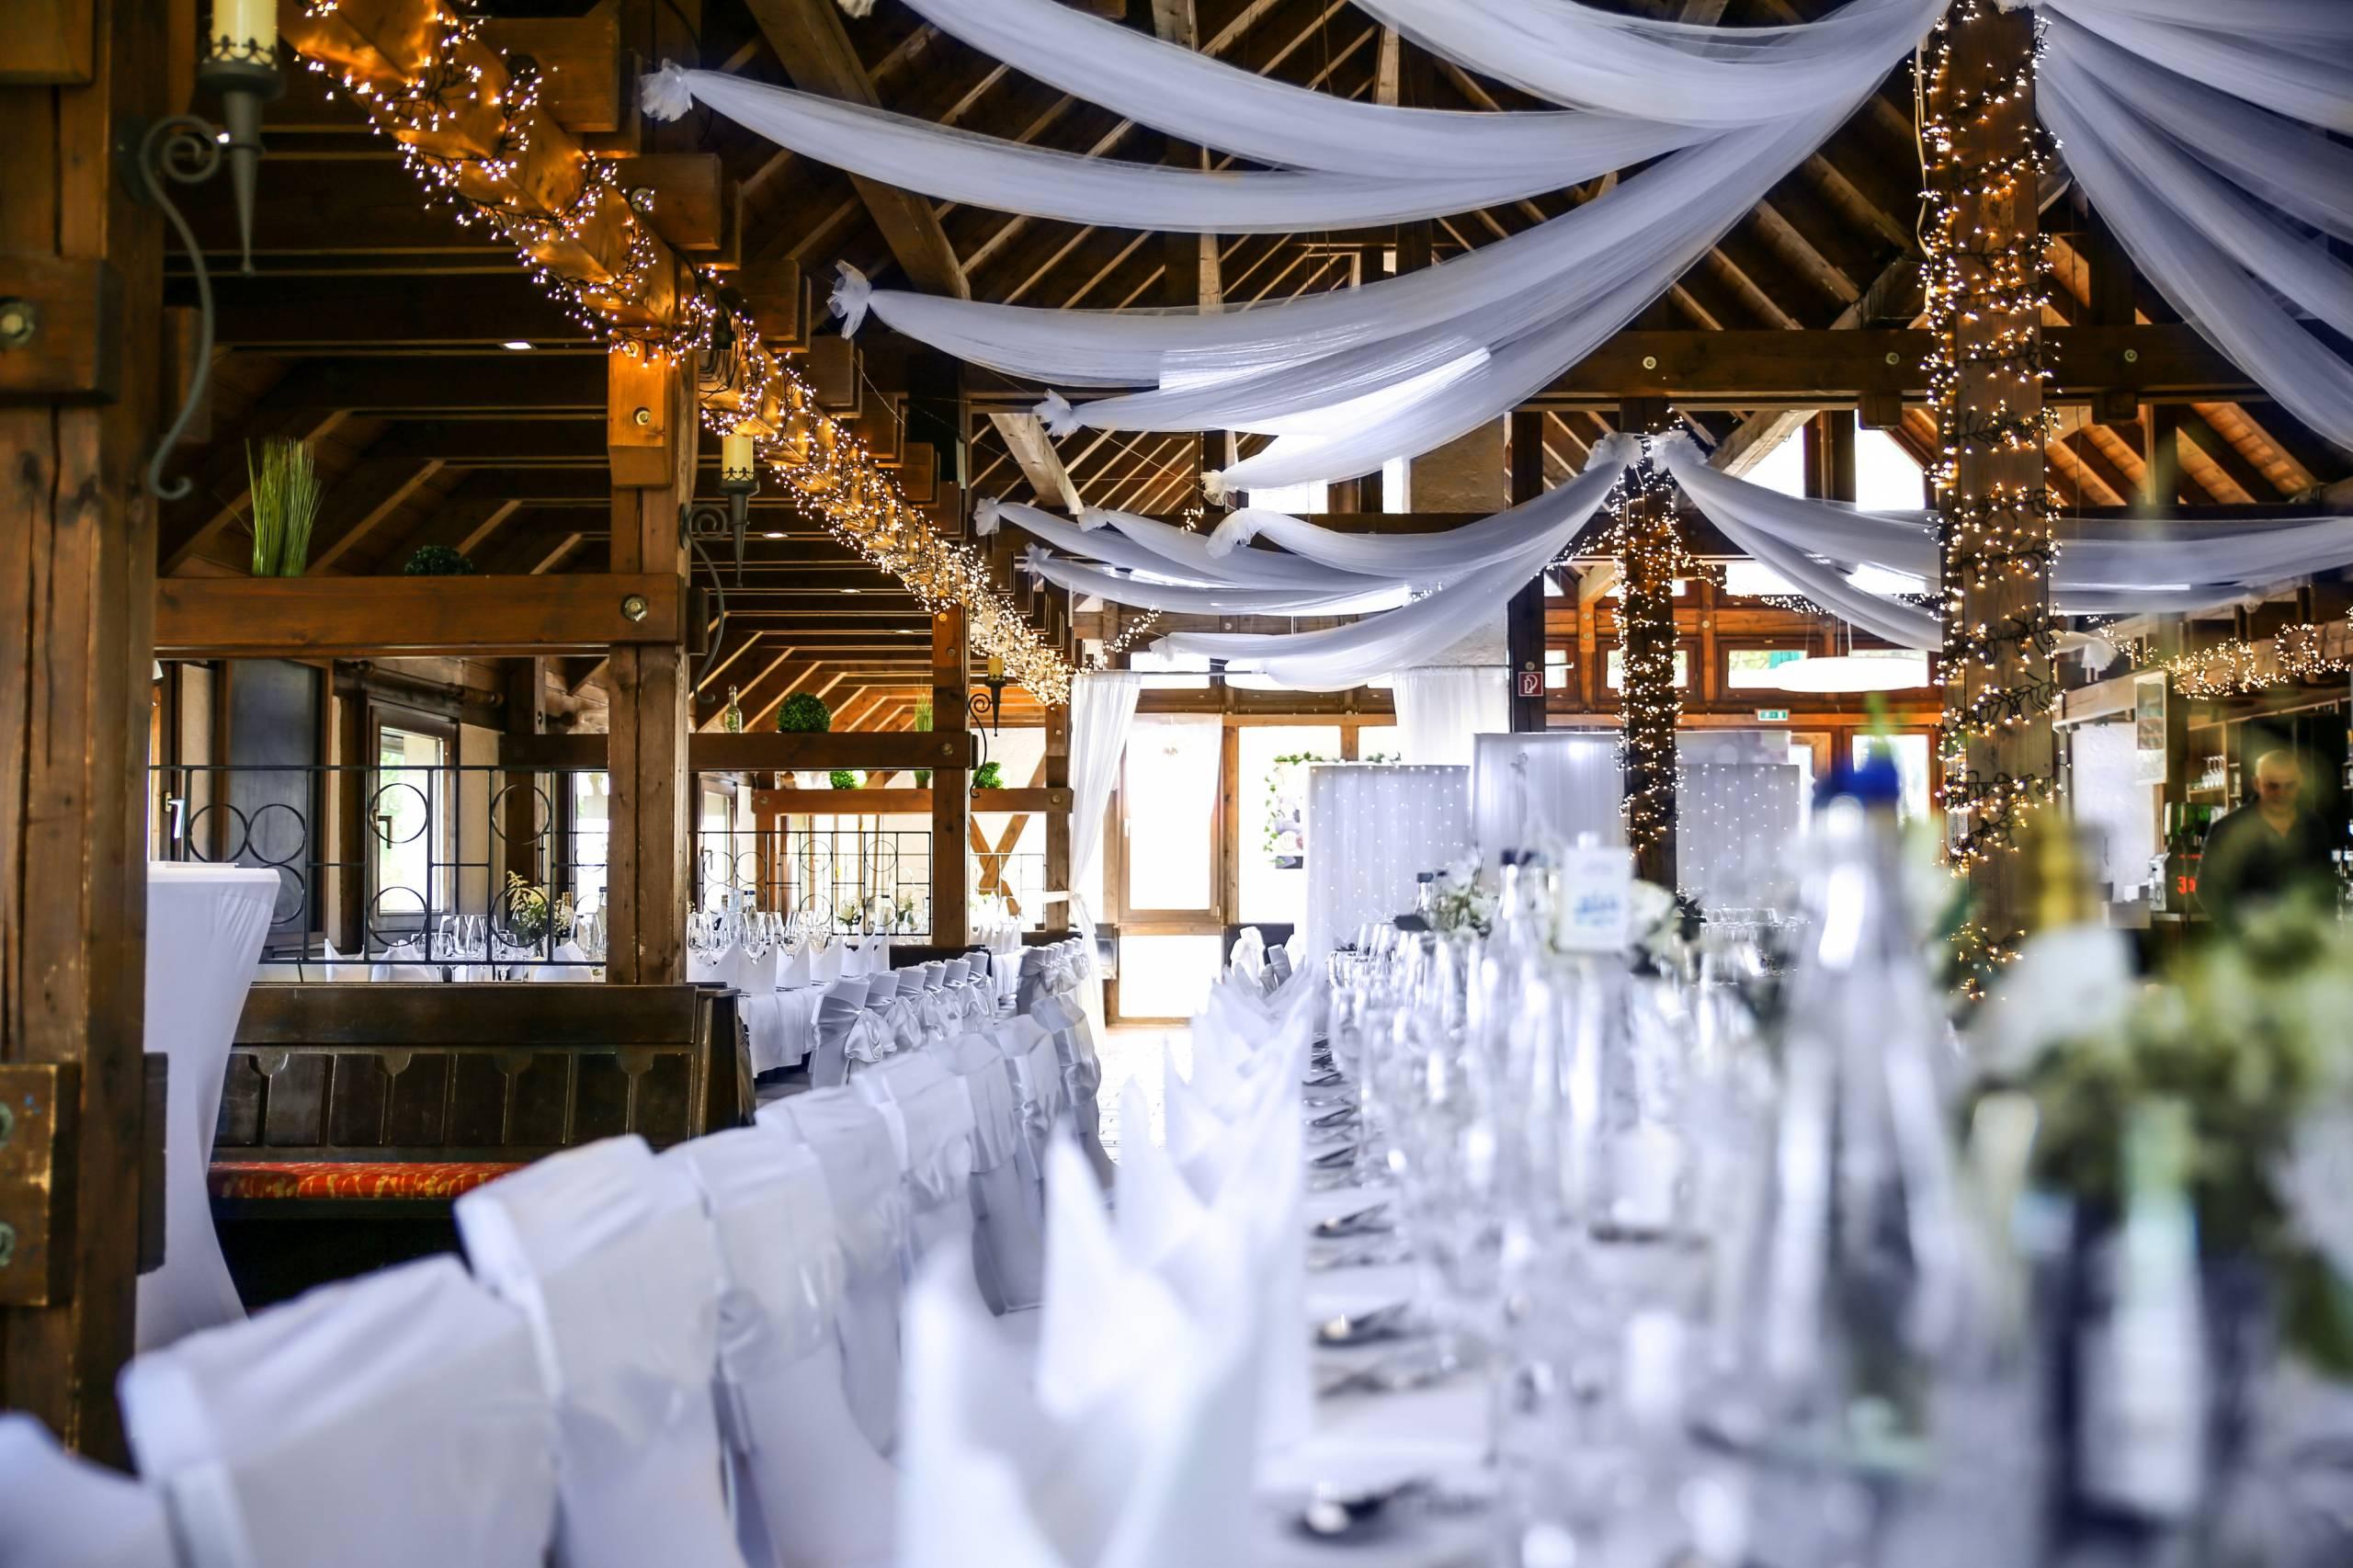 Hochzeitslocations Hannover Hochzeitslocations In Hannover Mieten